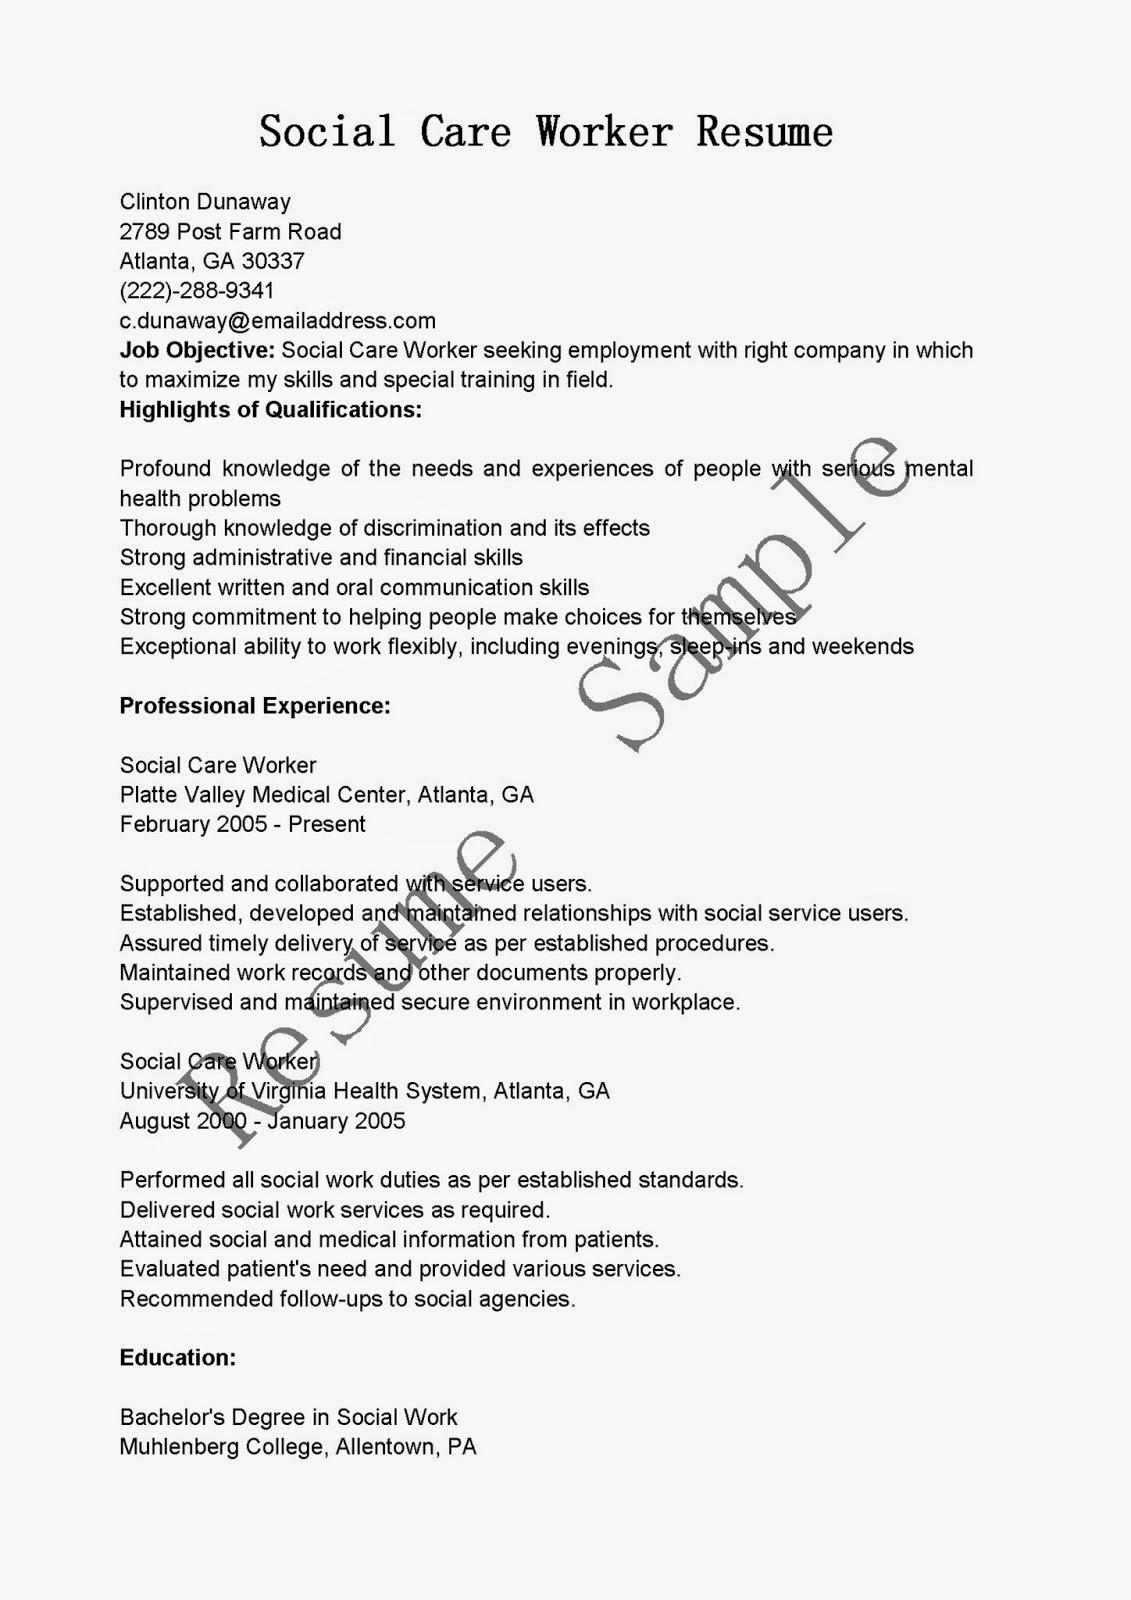 resume samples social care worker resume sample